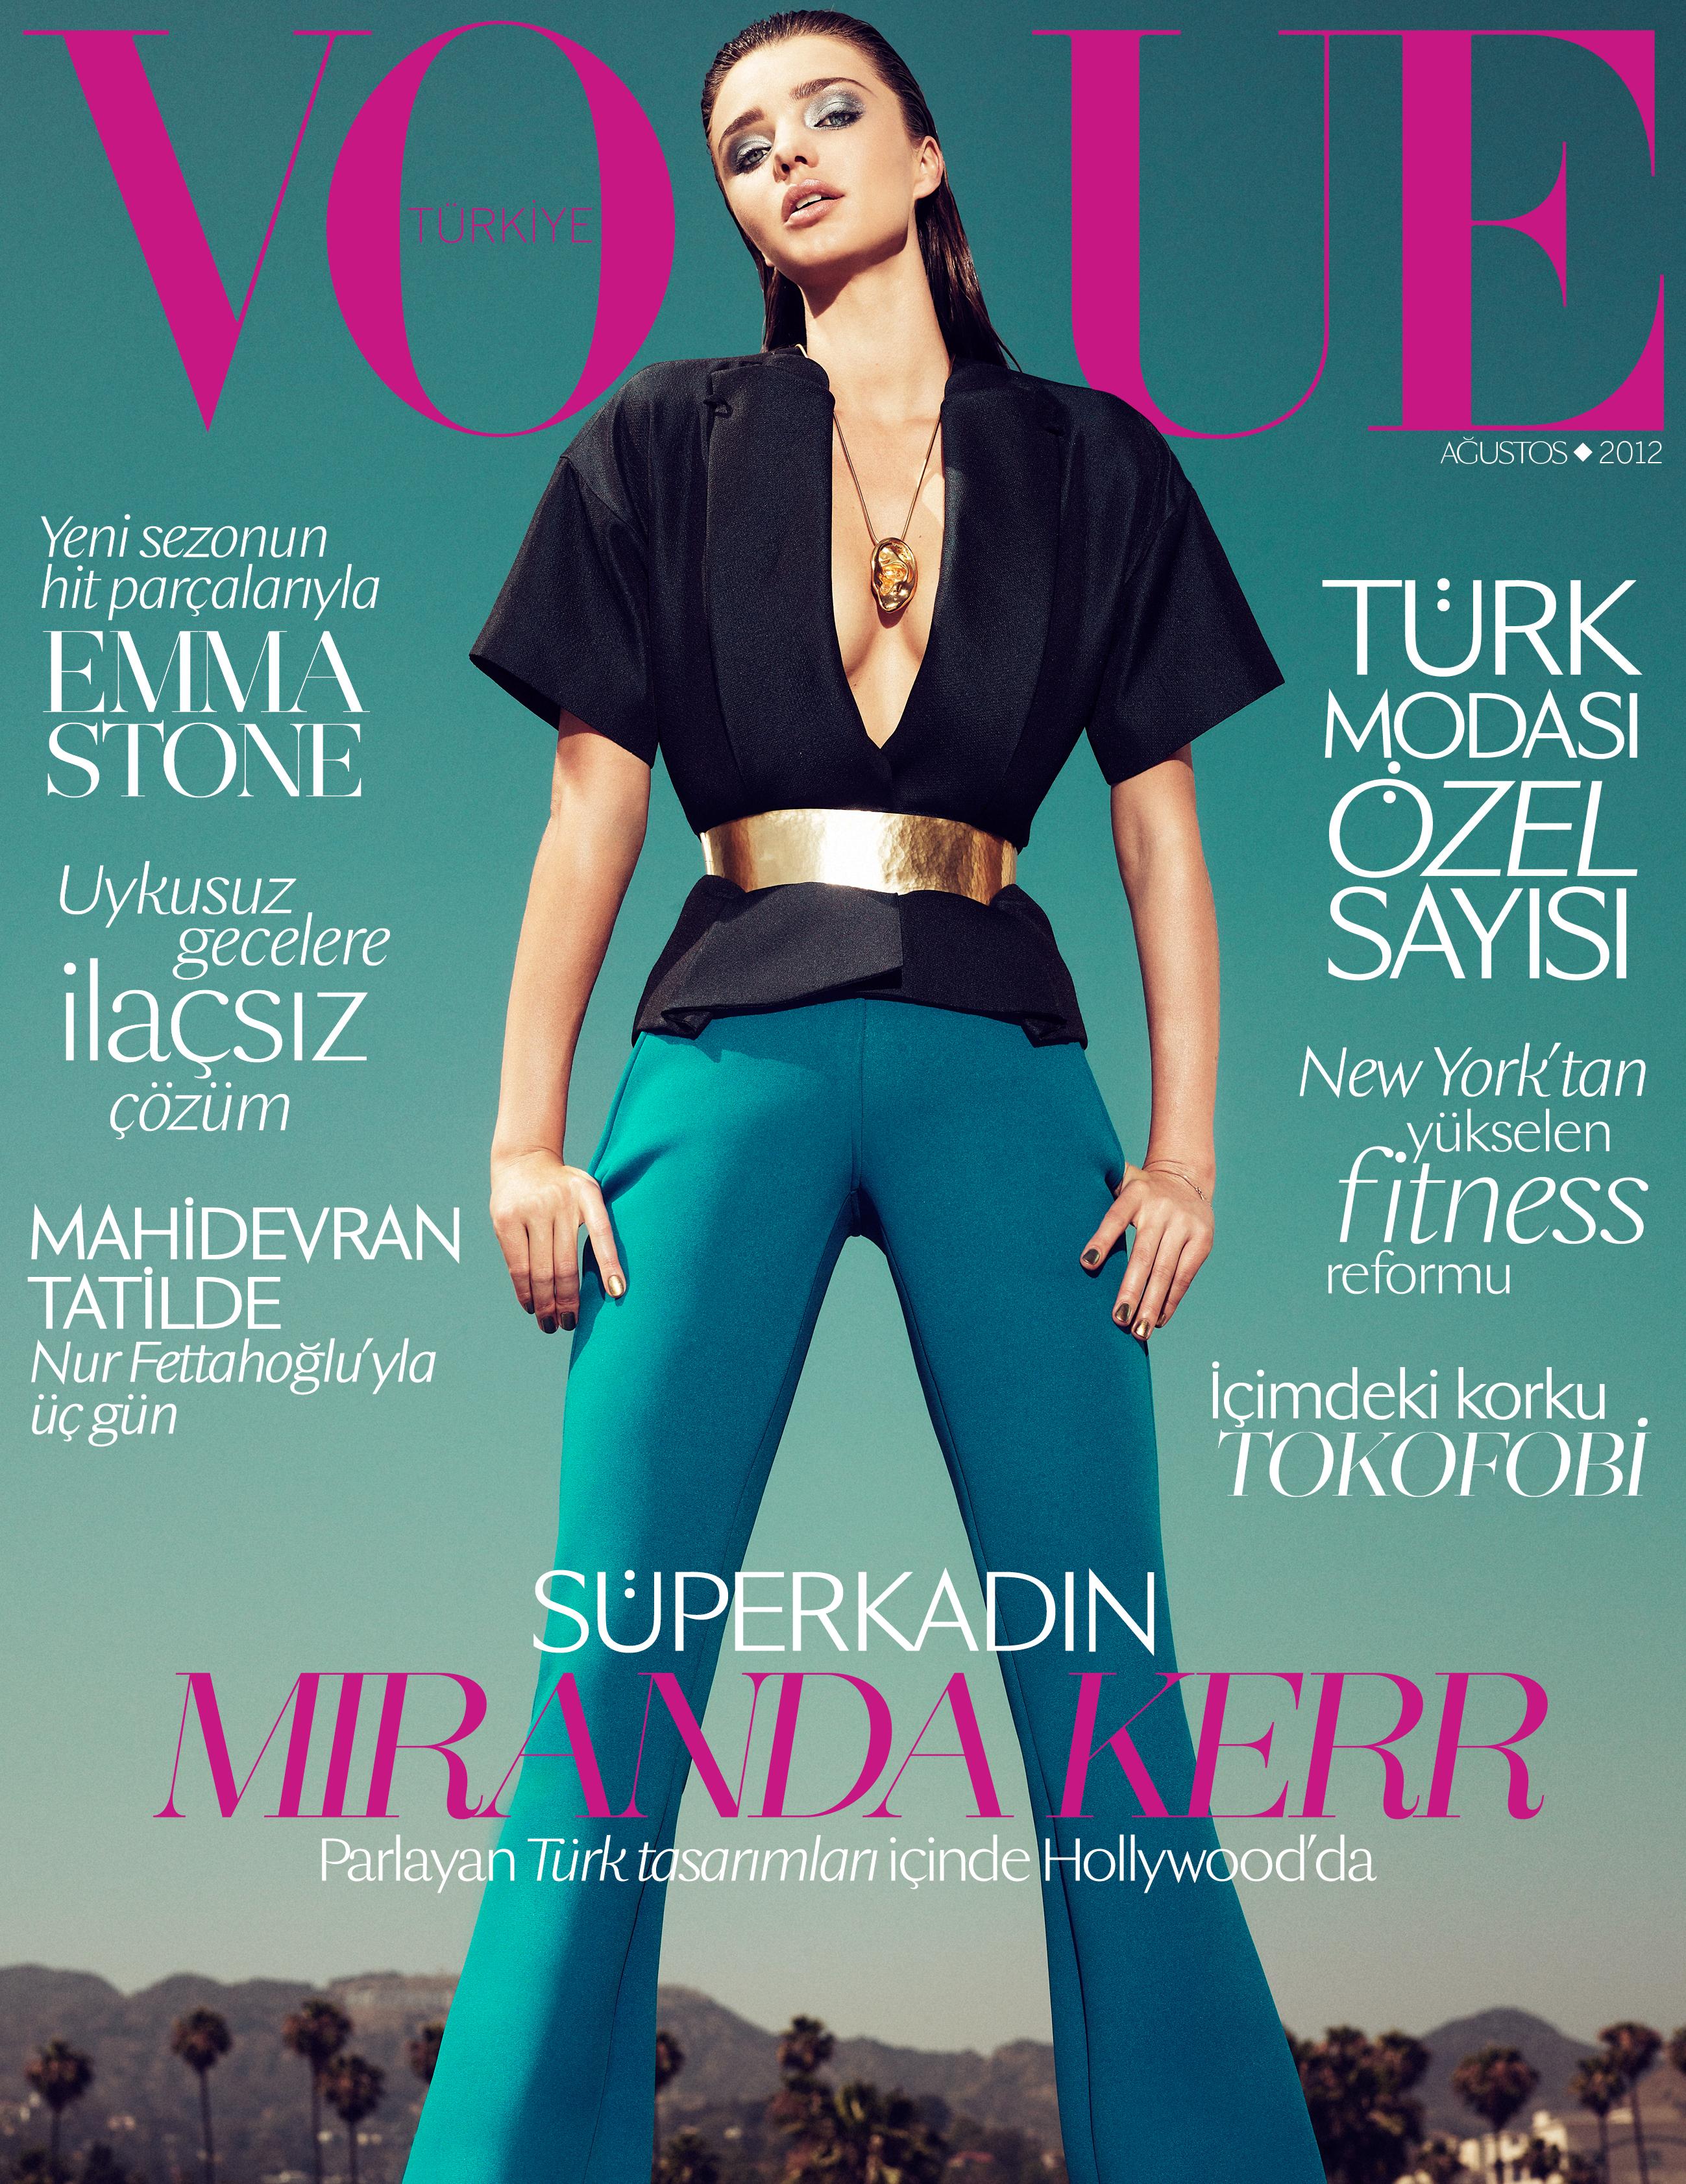 Süperkadın Miranda Kerr